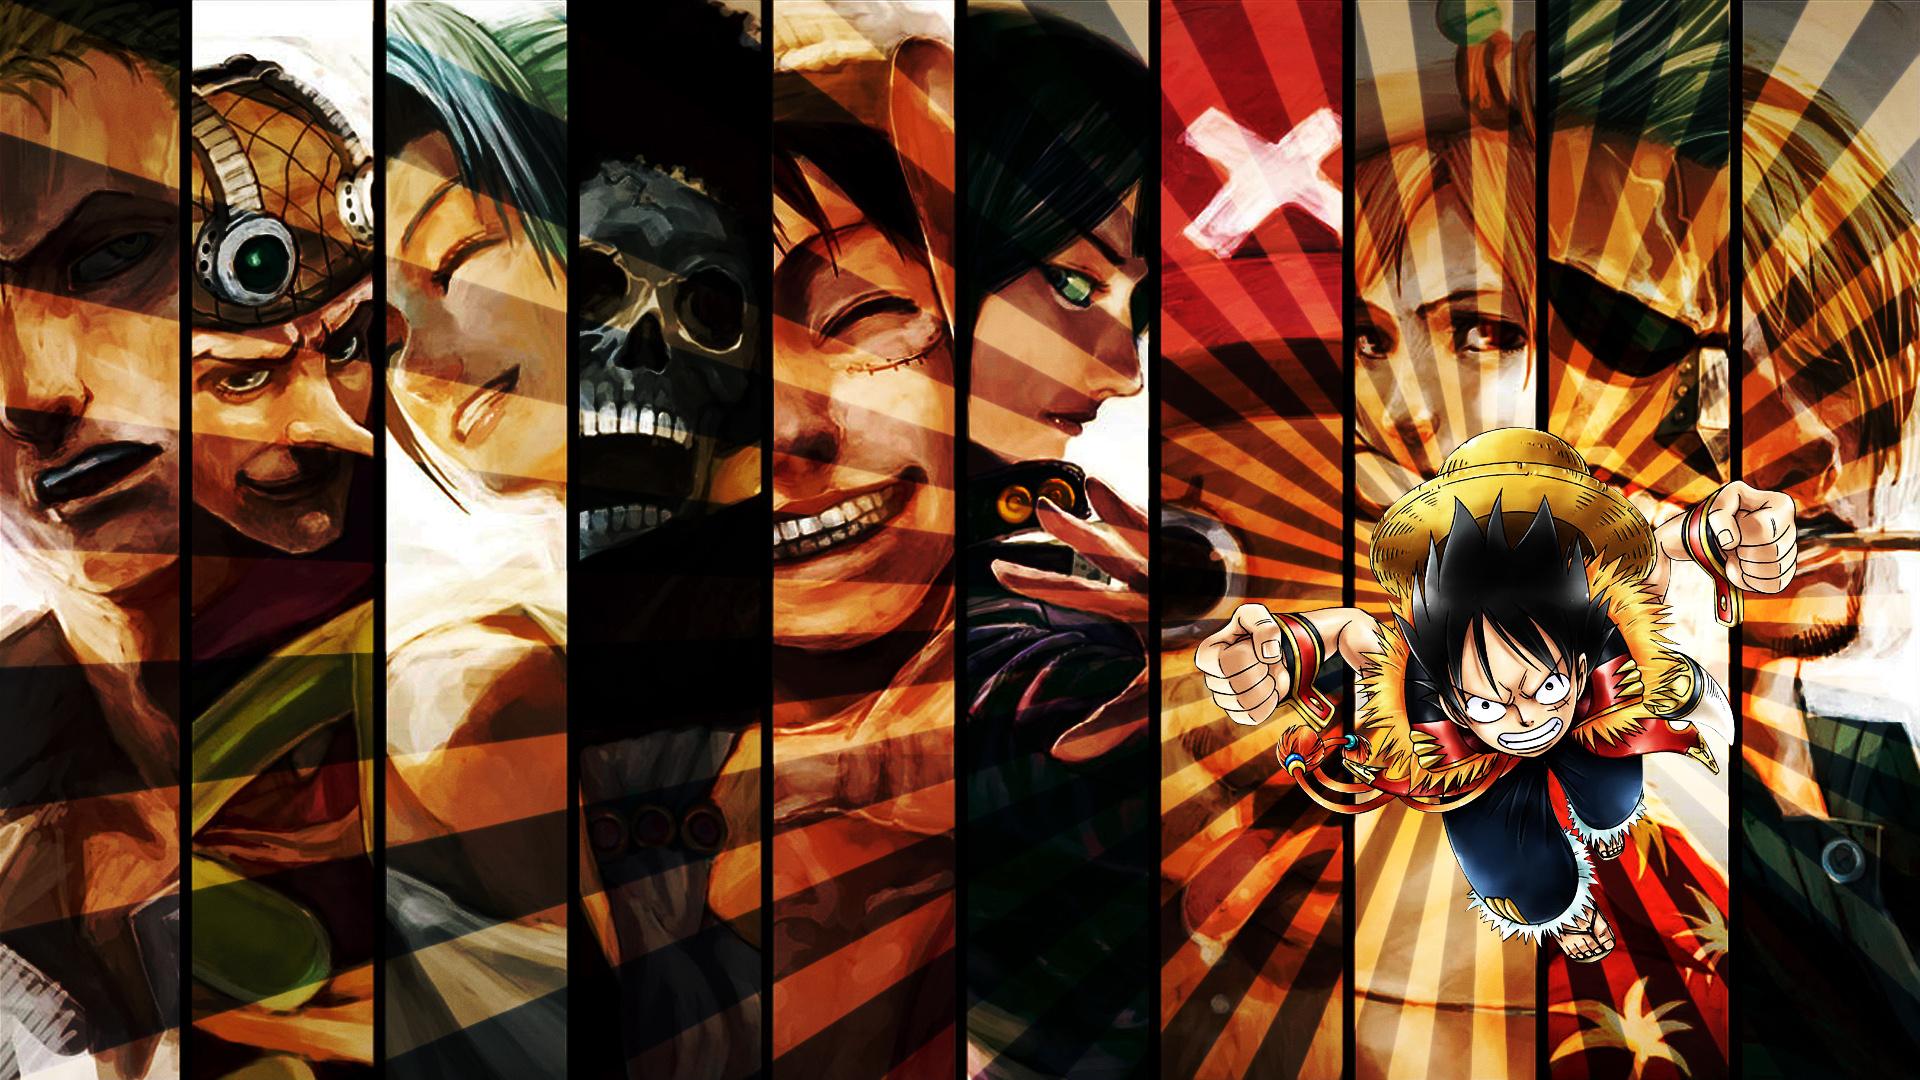 anime wallpaper one piece - wallpapersafari